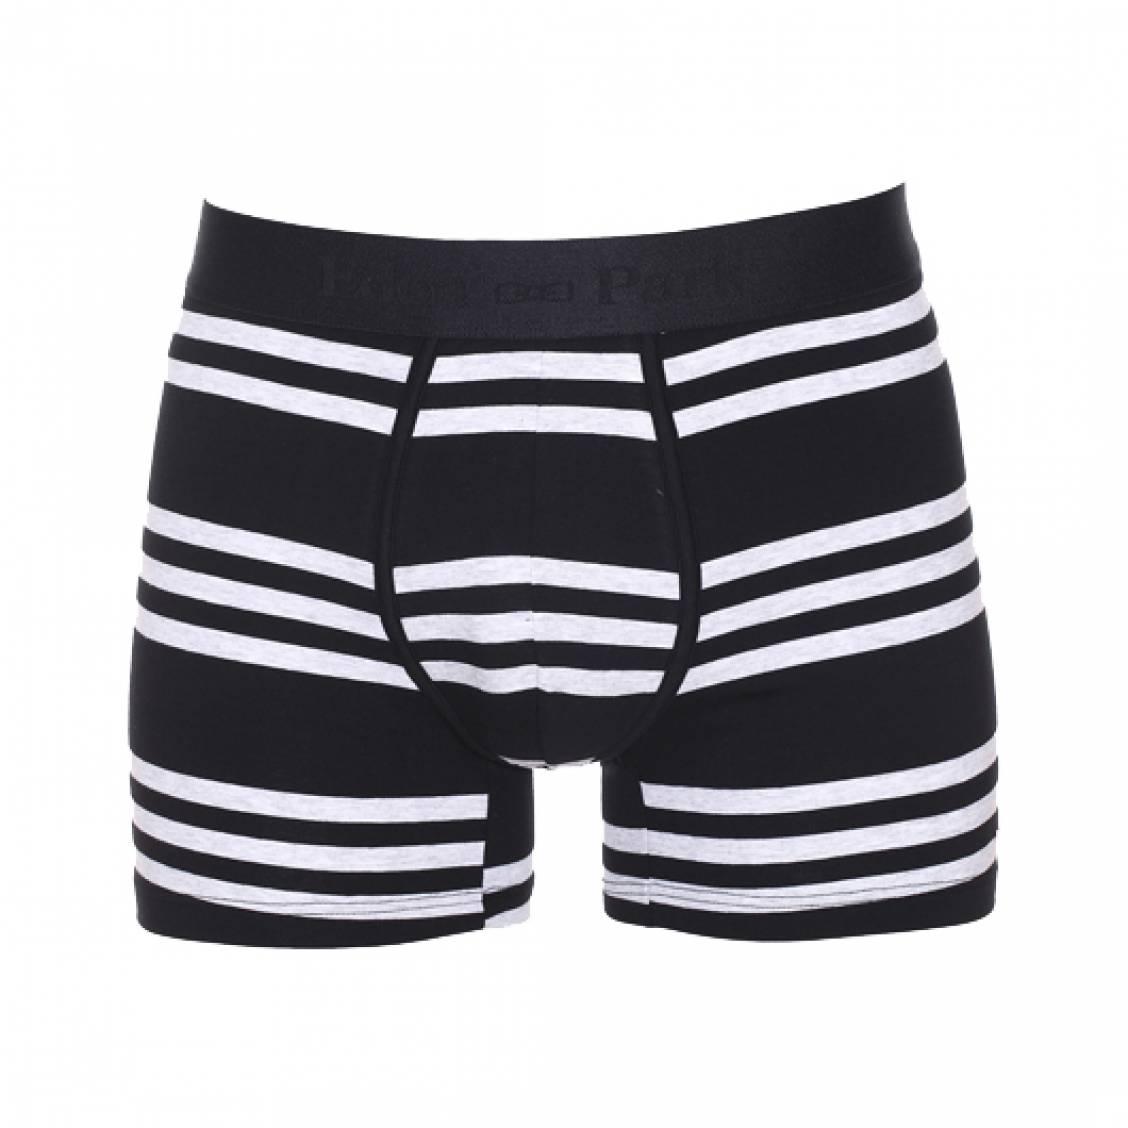 Boxer  en coton stretch noir � rayures horizontales gris clair